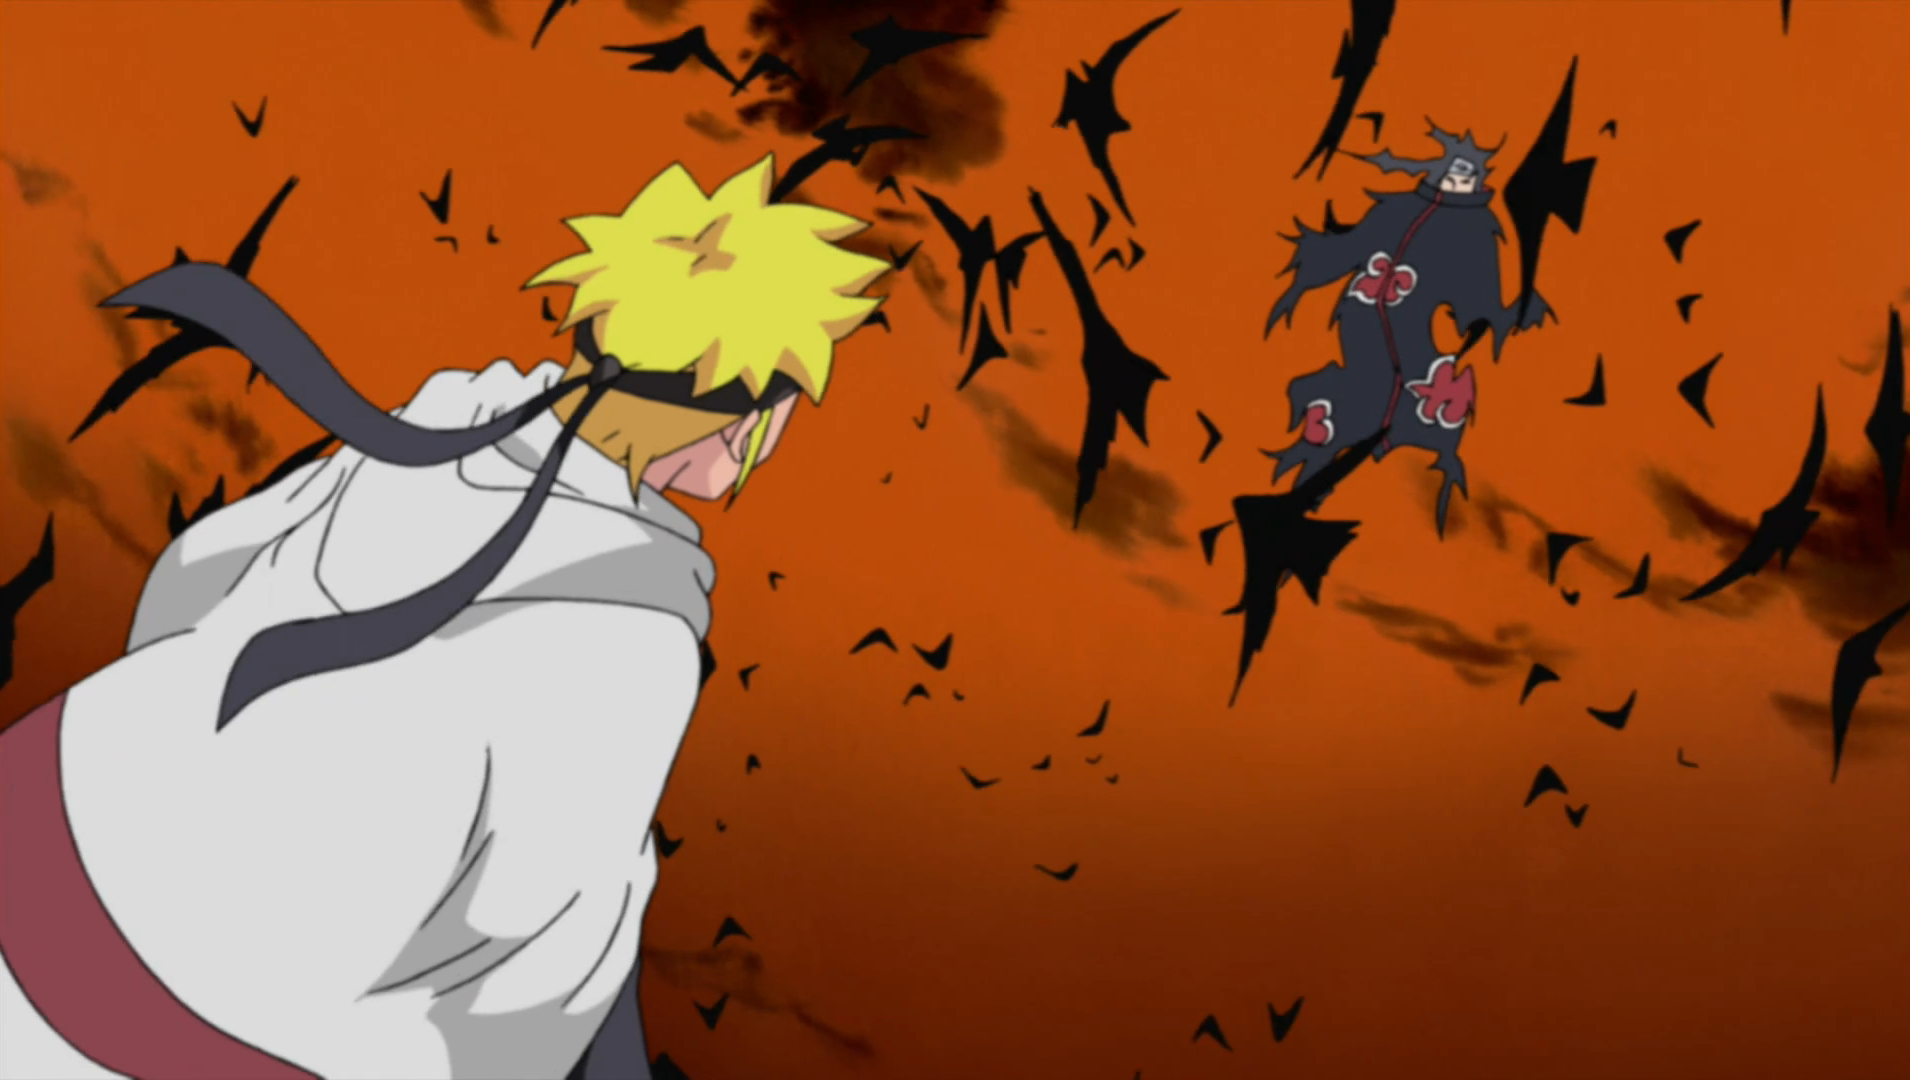 Itachi Uchiha | Narutopedia | Fandom